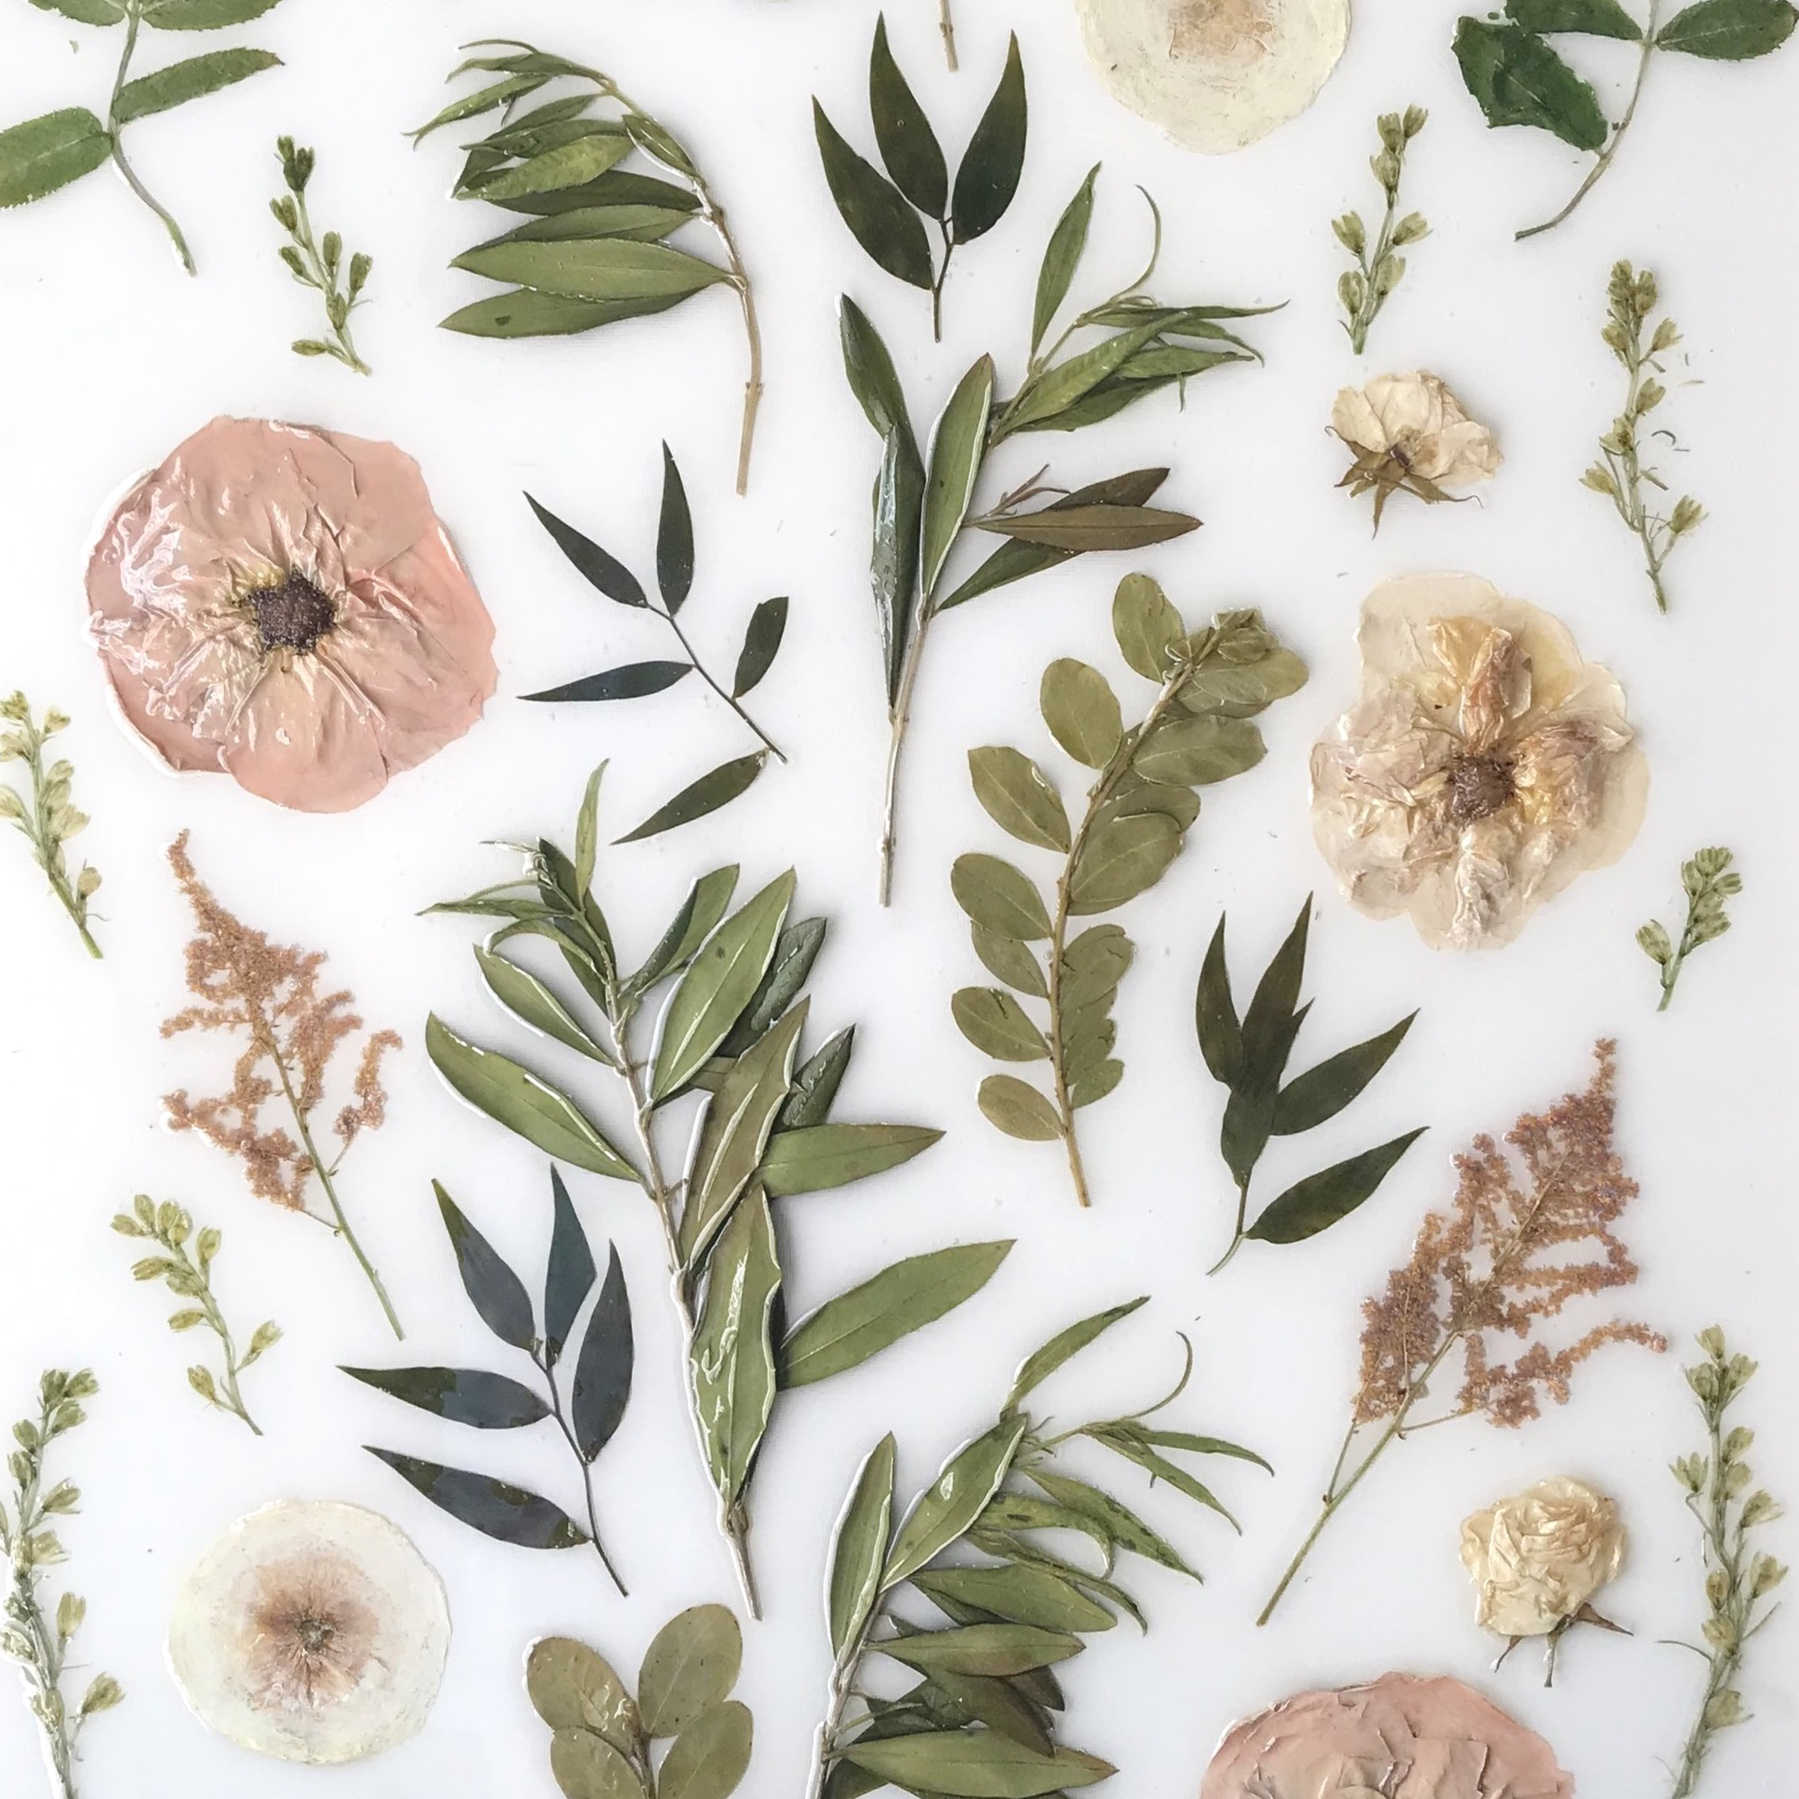 Wren & Rose Floral Design | Shelby Wren Boykin | Mississippi Wedding Florist | Floral Design | Pressed Flowers | Bouquet Keepsake | Bouquet Preservation